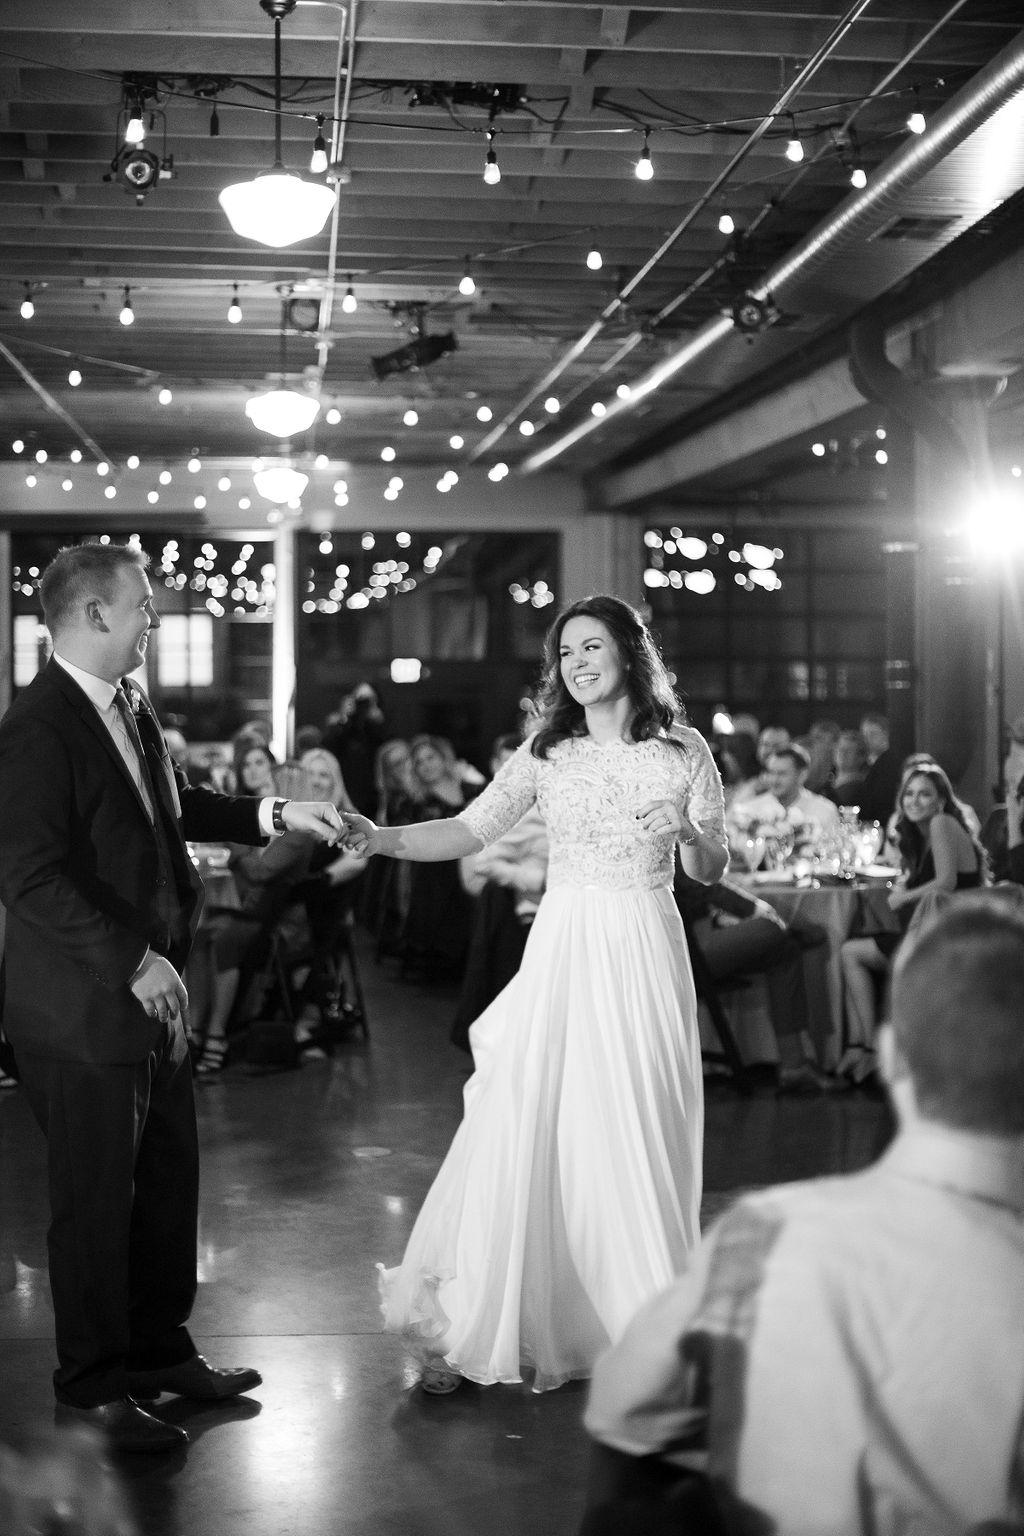 032_reception_portland,oregon,castaway,wedding,by_outlive_creative,photo,and,video.jpg